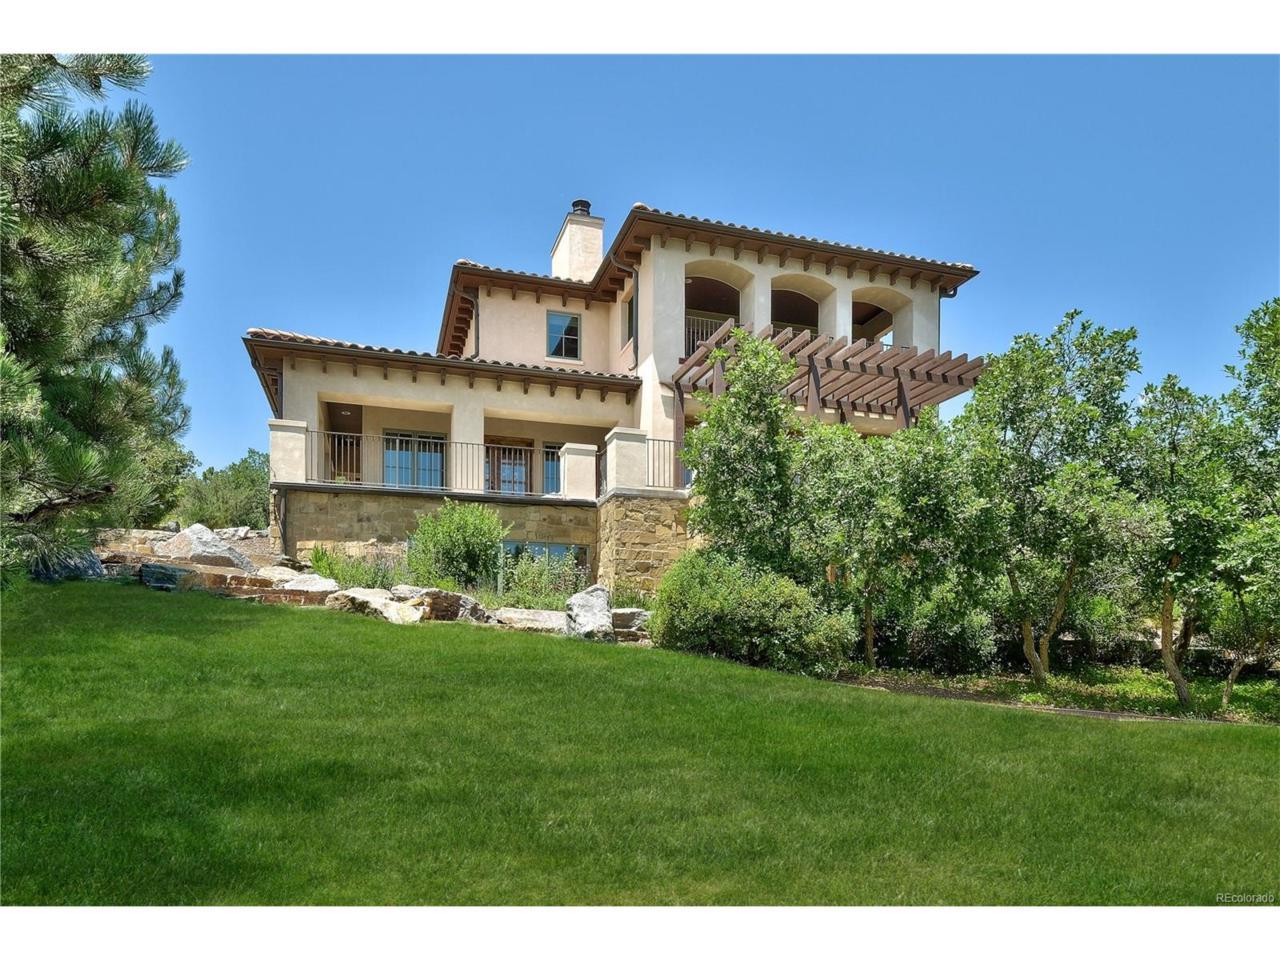 713 Golf Club Drive, Castle Rock, CO 80108 (MLS #7836098) :: 8z Real Estate